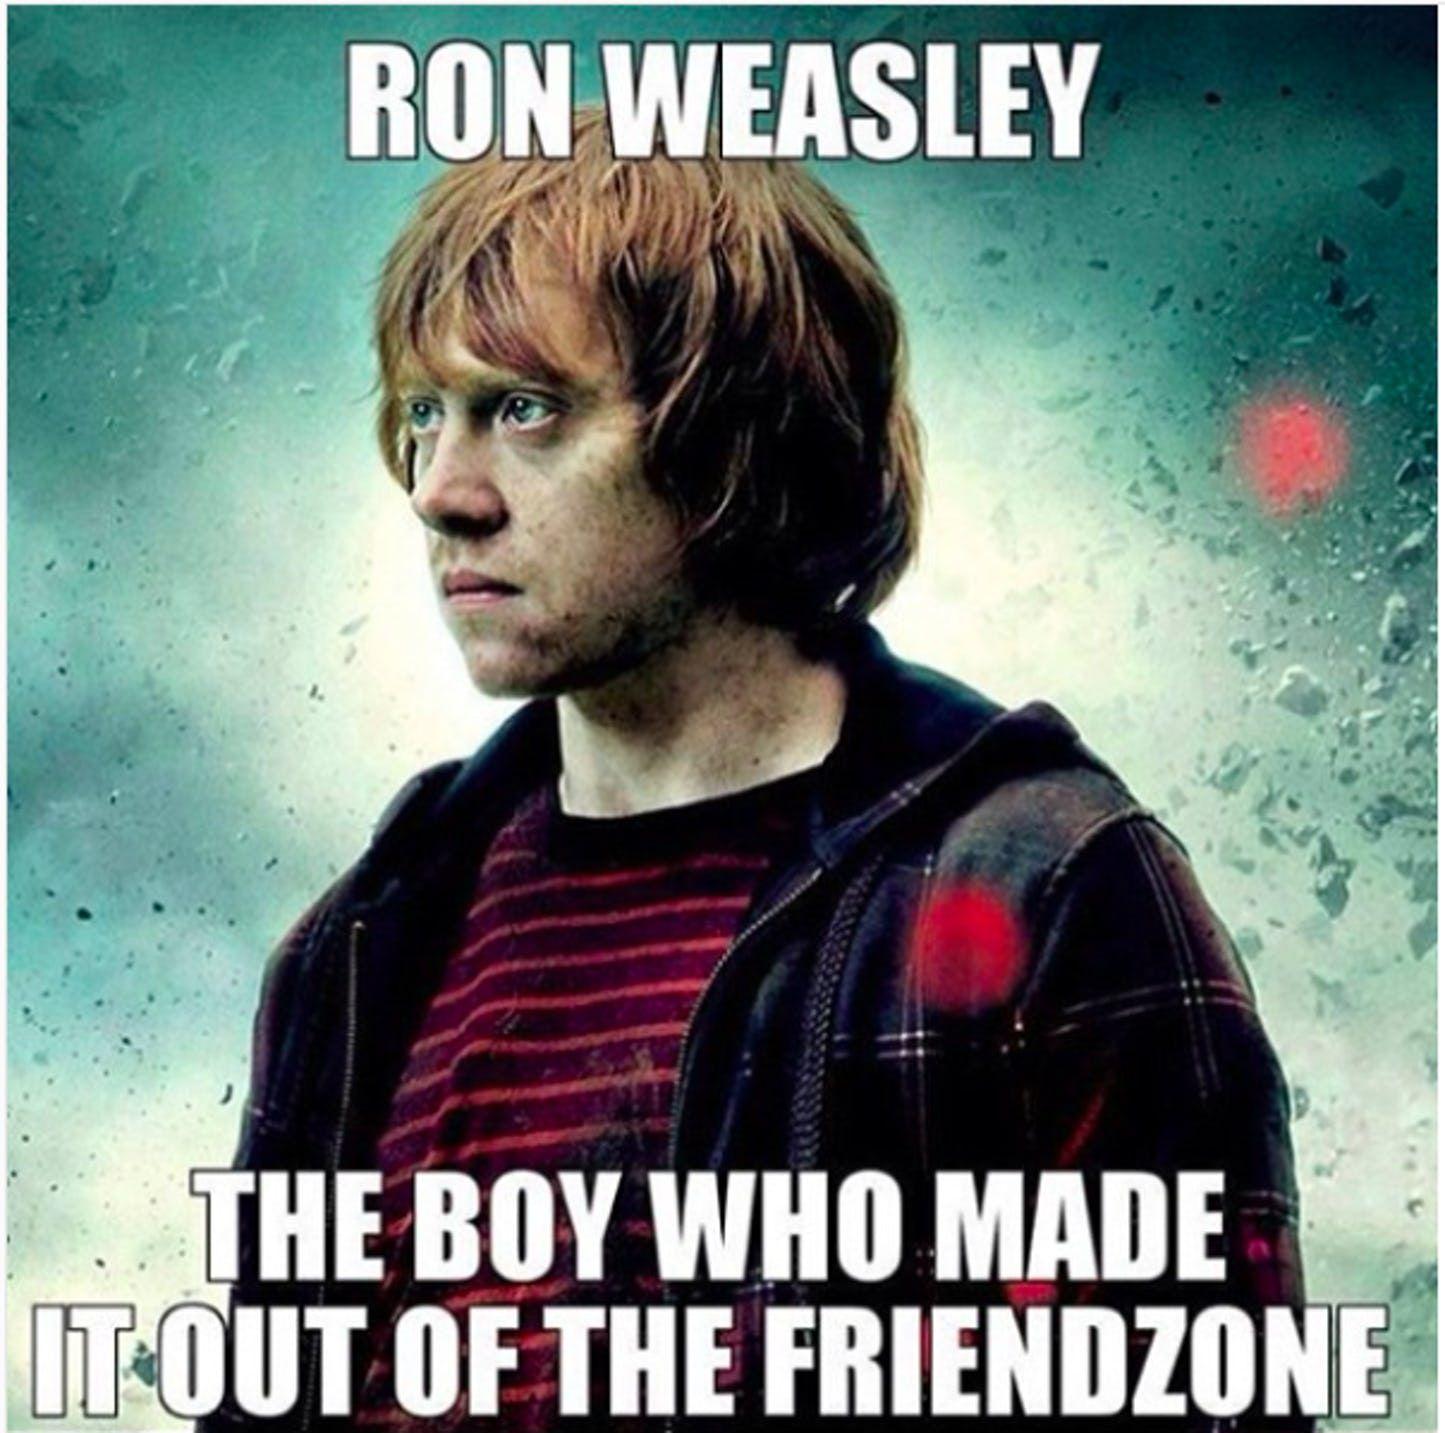 Harry Potter Memes Only A True Potterhead Can Understand Part 3 Harrypotter Memes Pot Harry Potter Memes Hilarious Harry Potter Memes Harry Potter Jokes